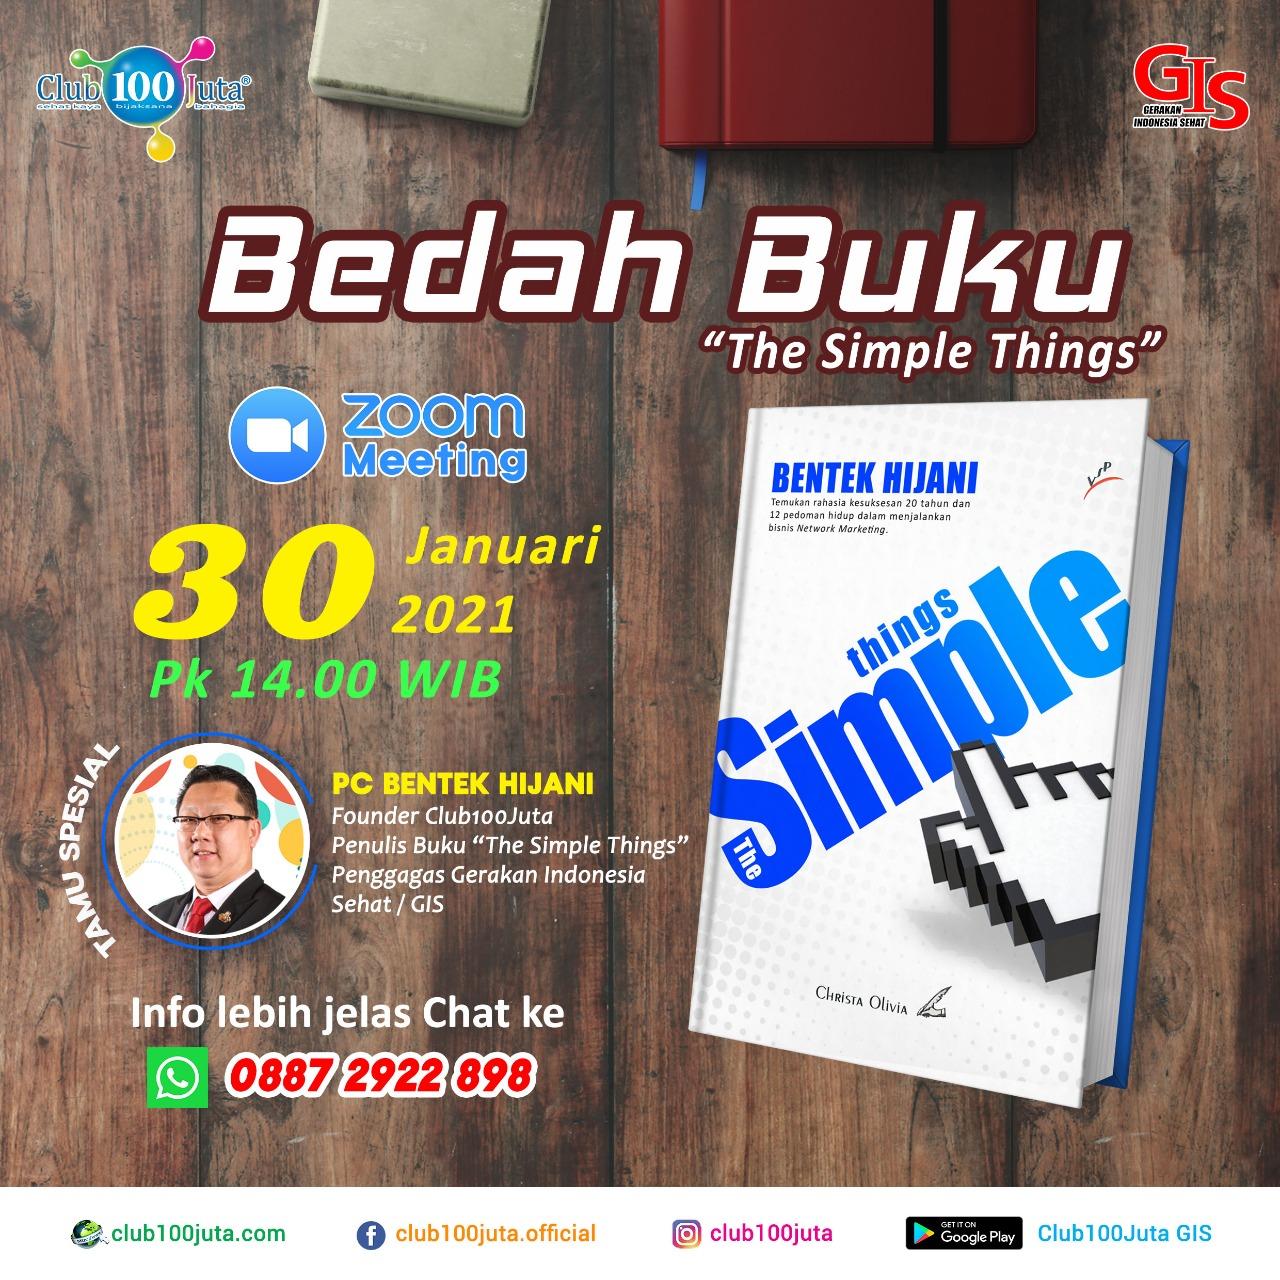 Bedah Buku (The Simple Things) - Edisi 30 Januari 2021